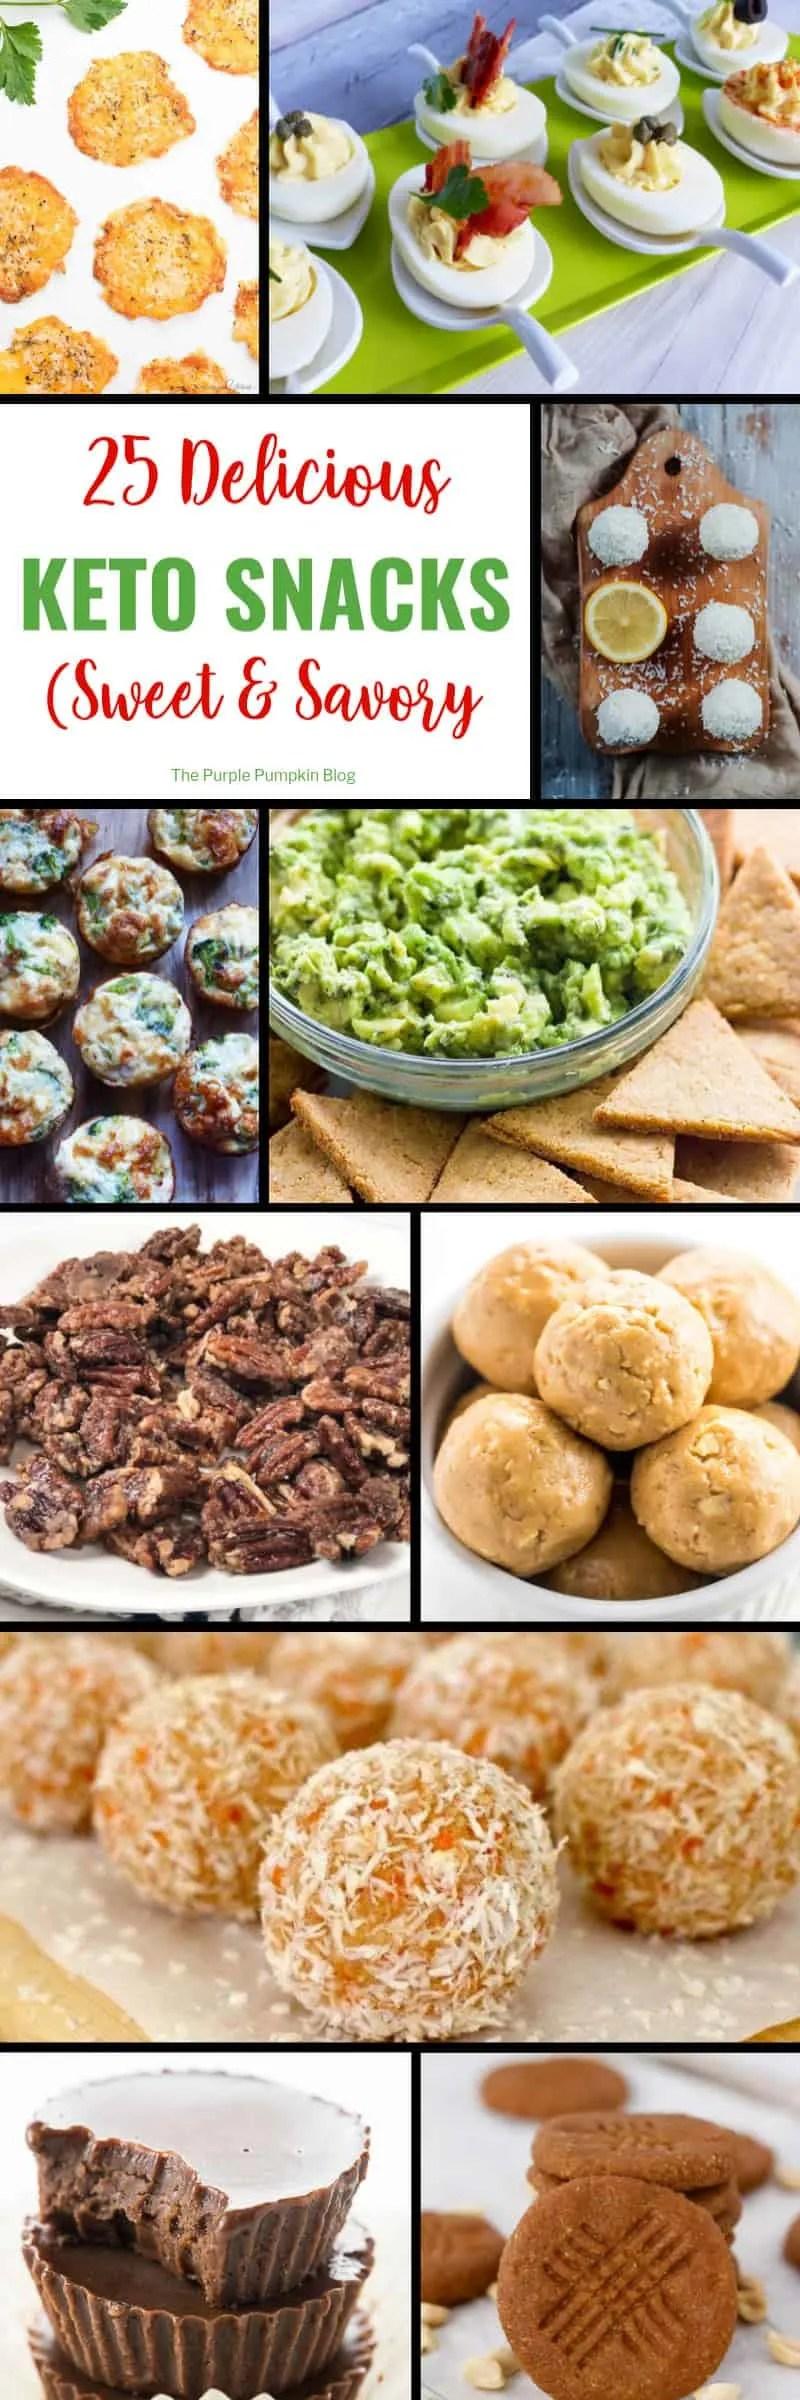 25 Delicious Keto Snacks Sweet & Savory